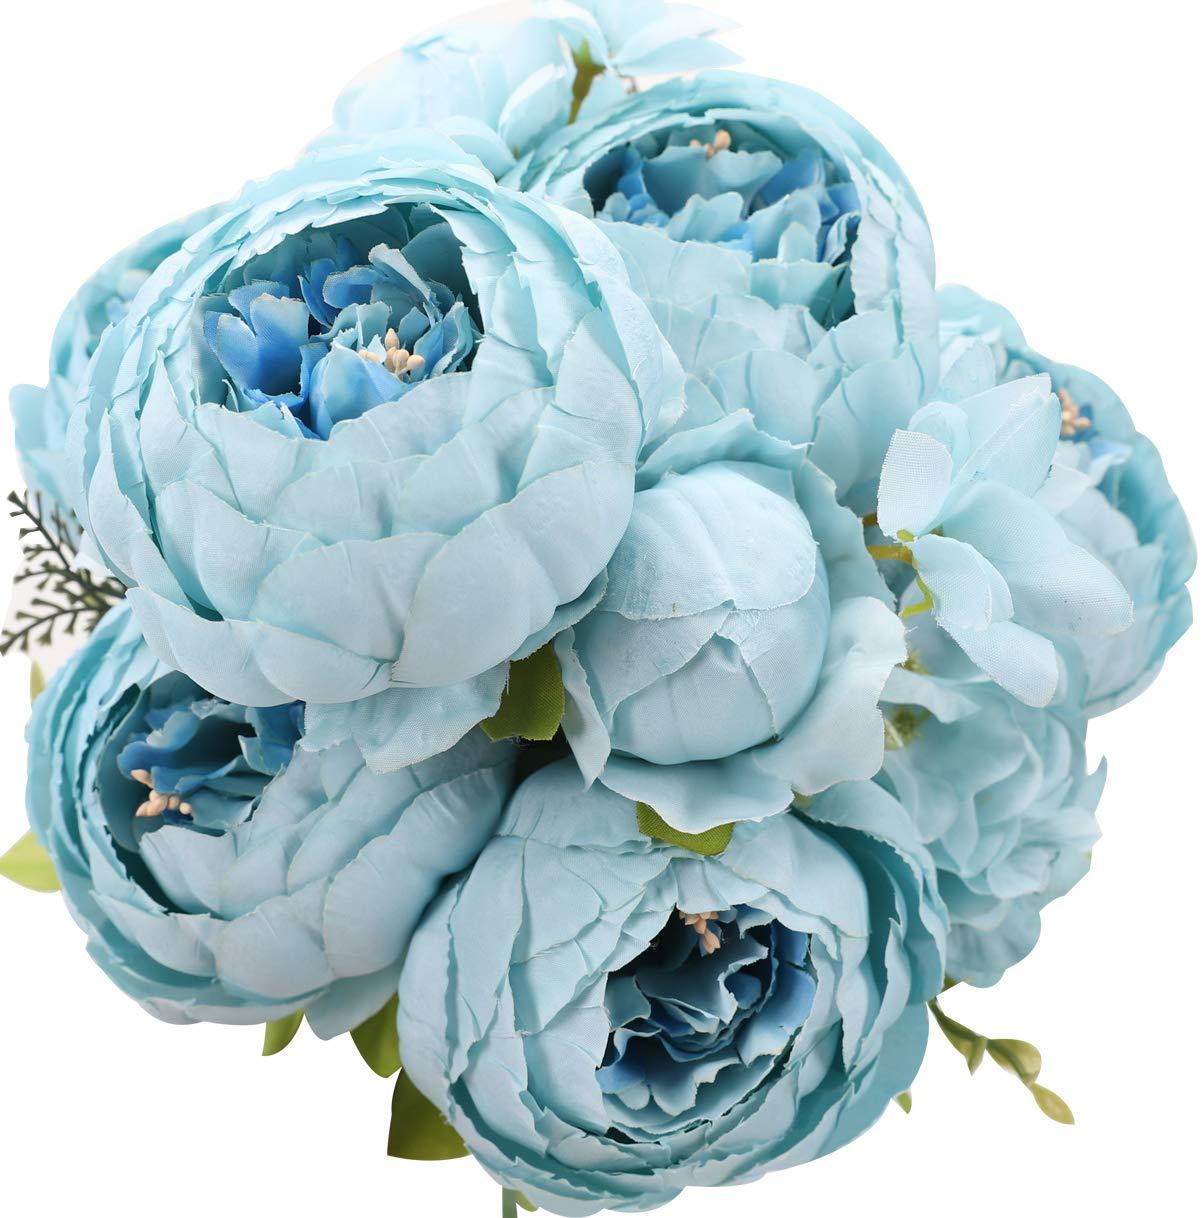 silk flower arrangements duovlo artificial peony silk flowers fake flowers vintage wedding home decoration,pack of 1 (spring blue)